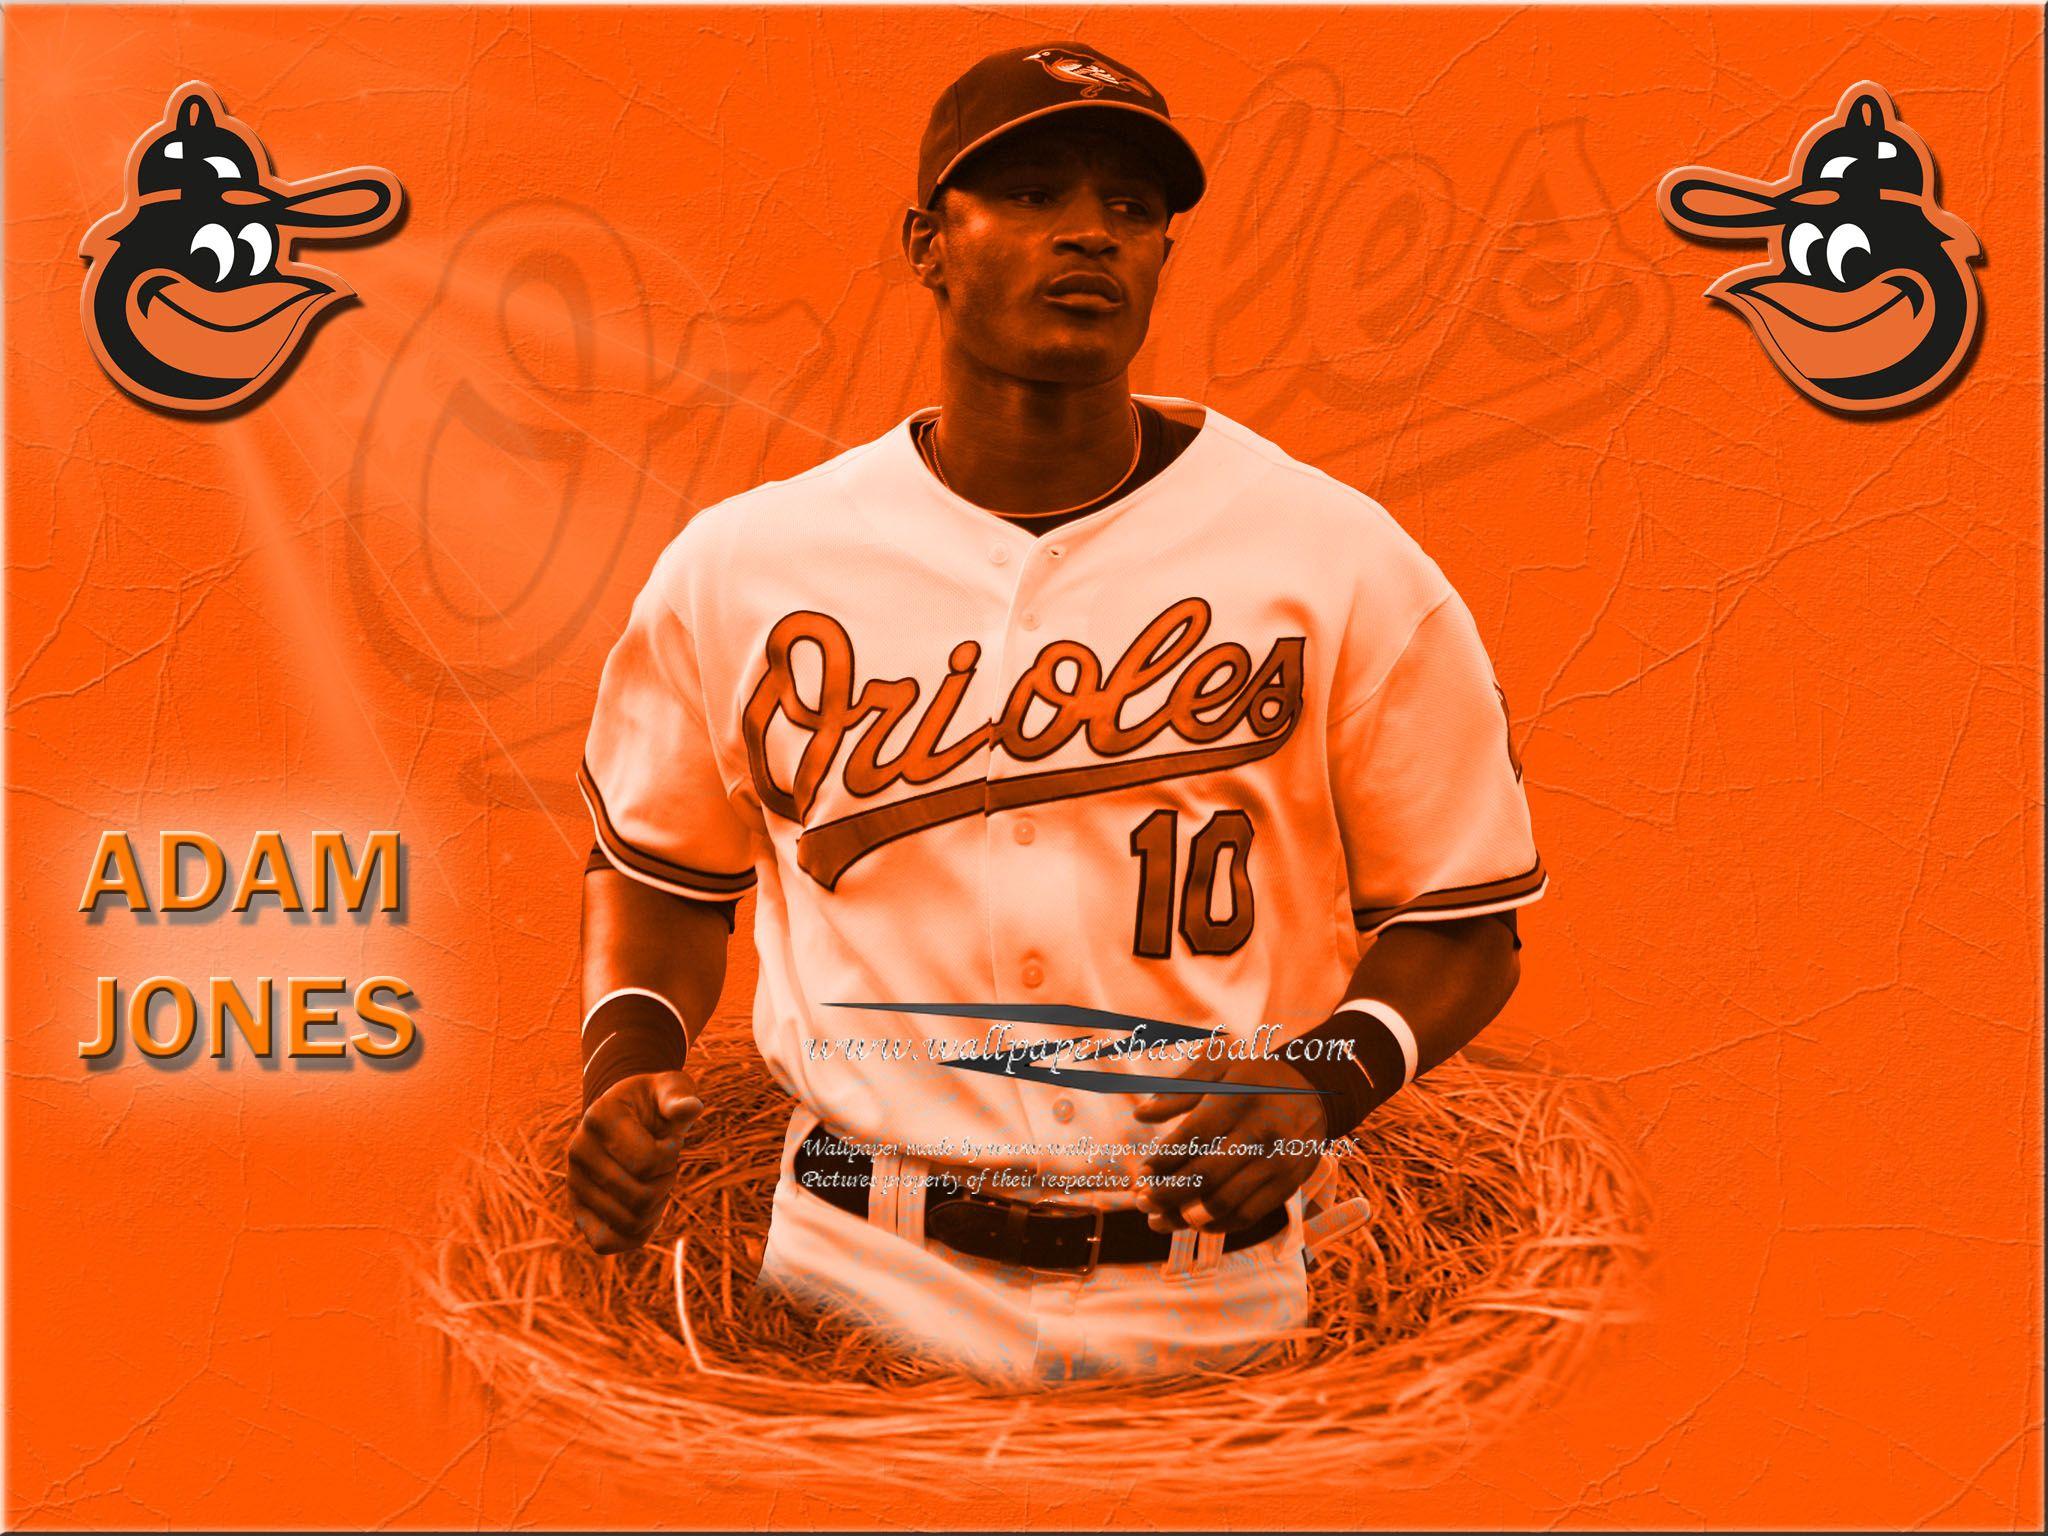 Baltimore Orioles Mlb Baseball Wallpaper 1586403 Hd Wallpaper Backgrounds Download